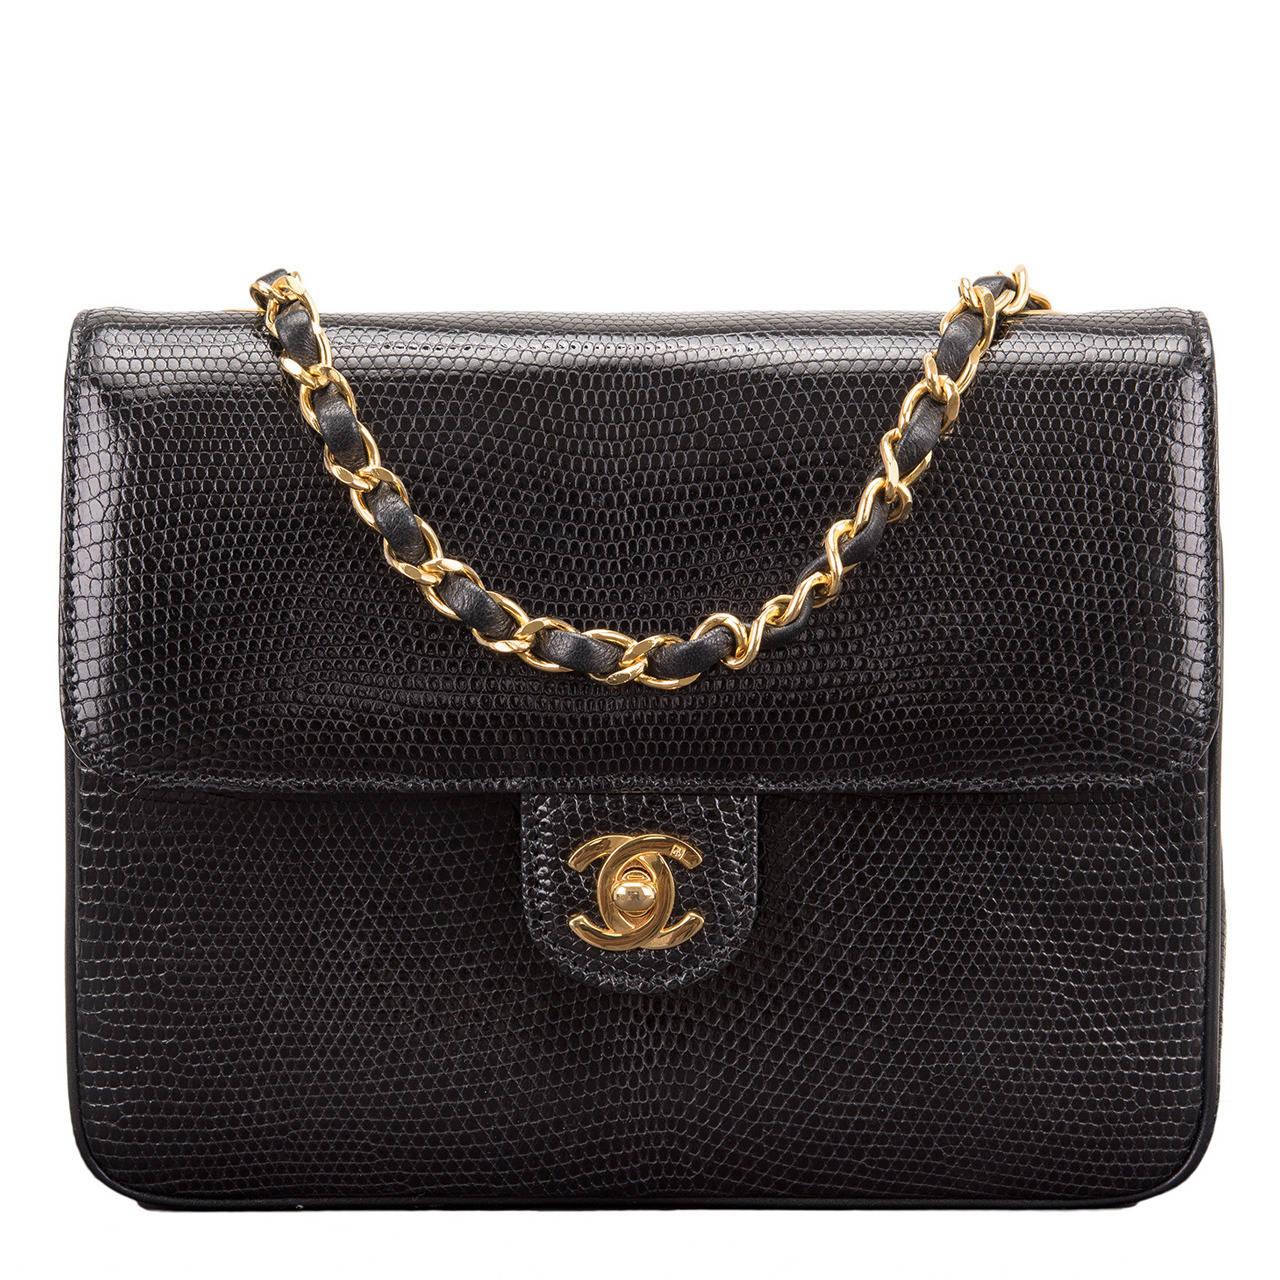 Chanel Vintage Black Lizard Large Mini Flap Bag For Sale